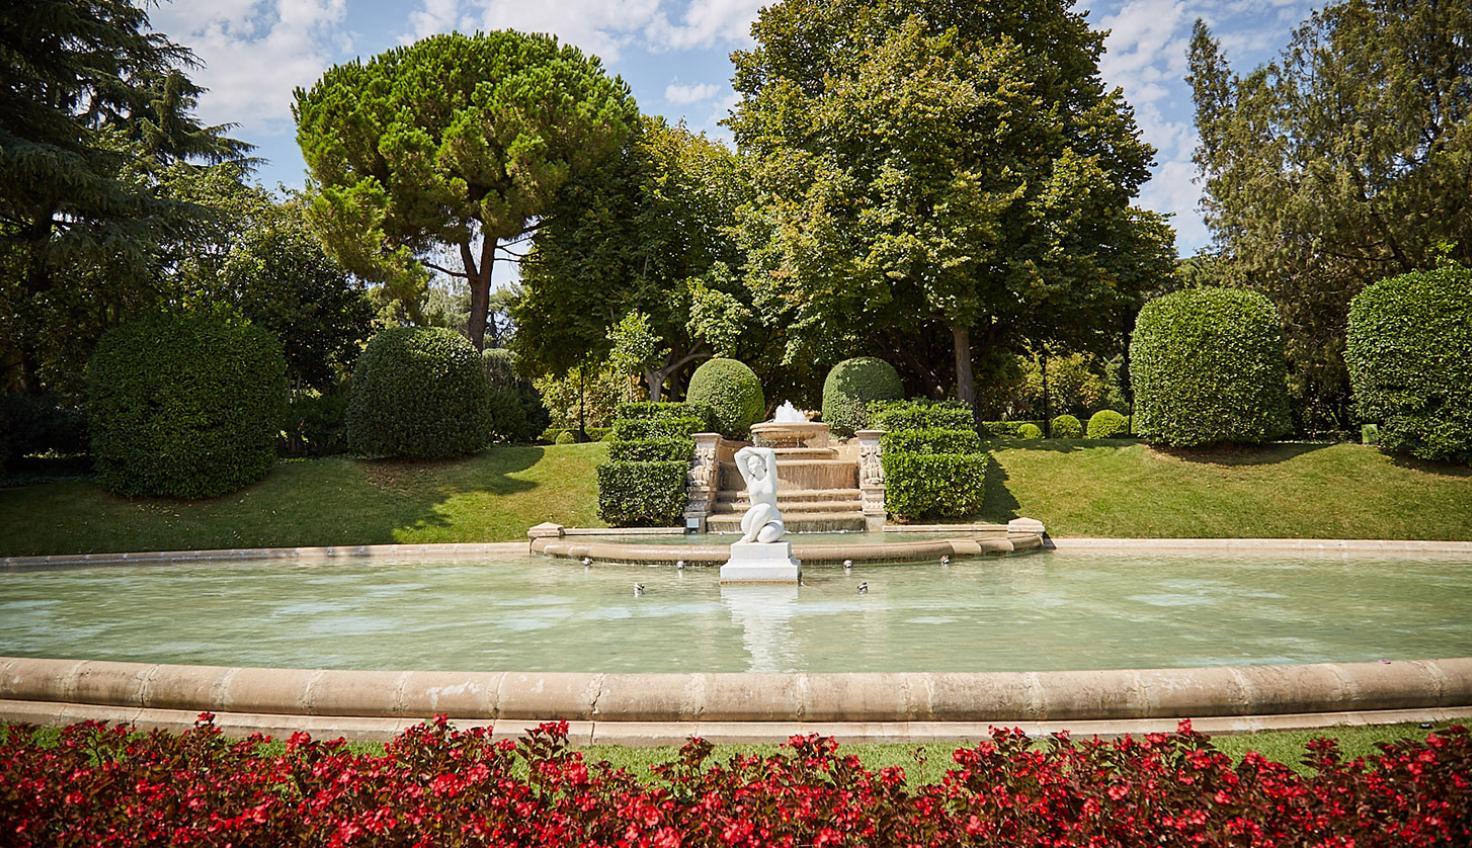 Photo Royal Palace of Pedralbes